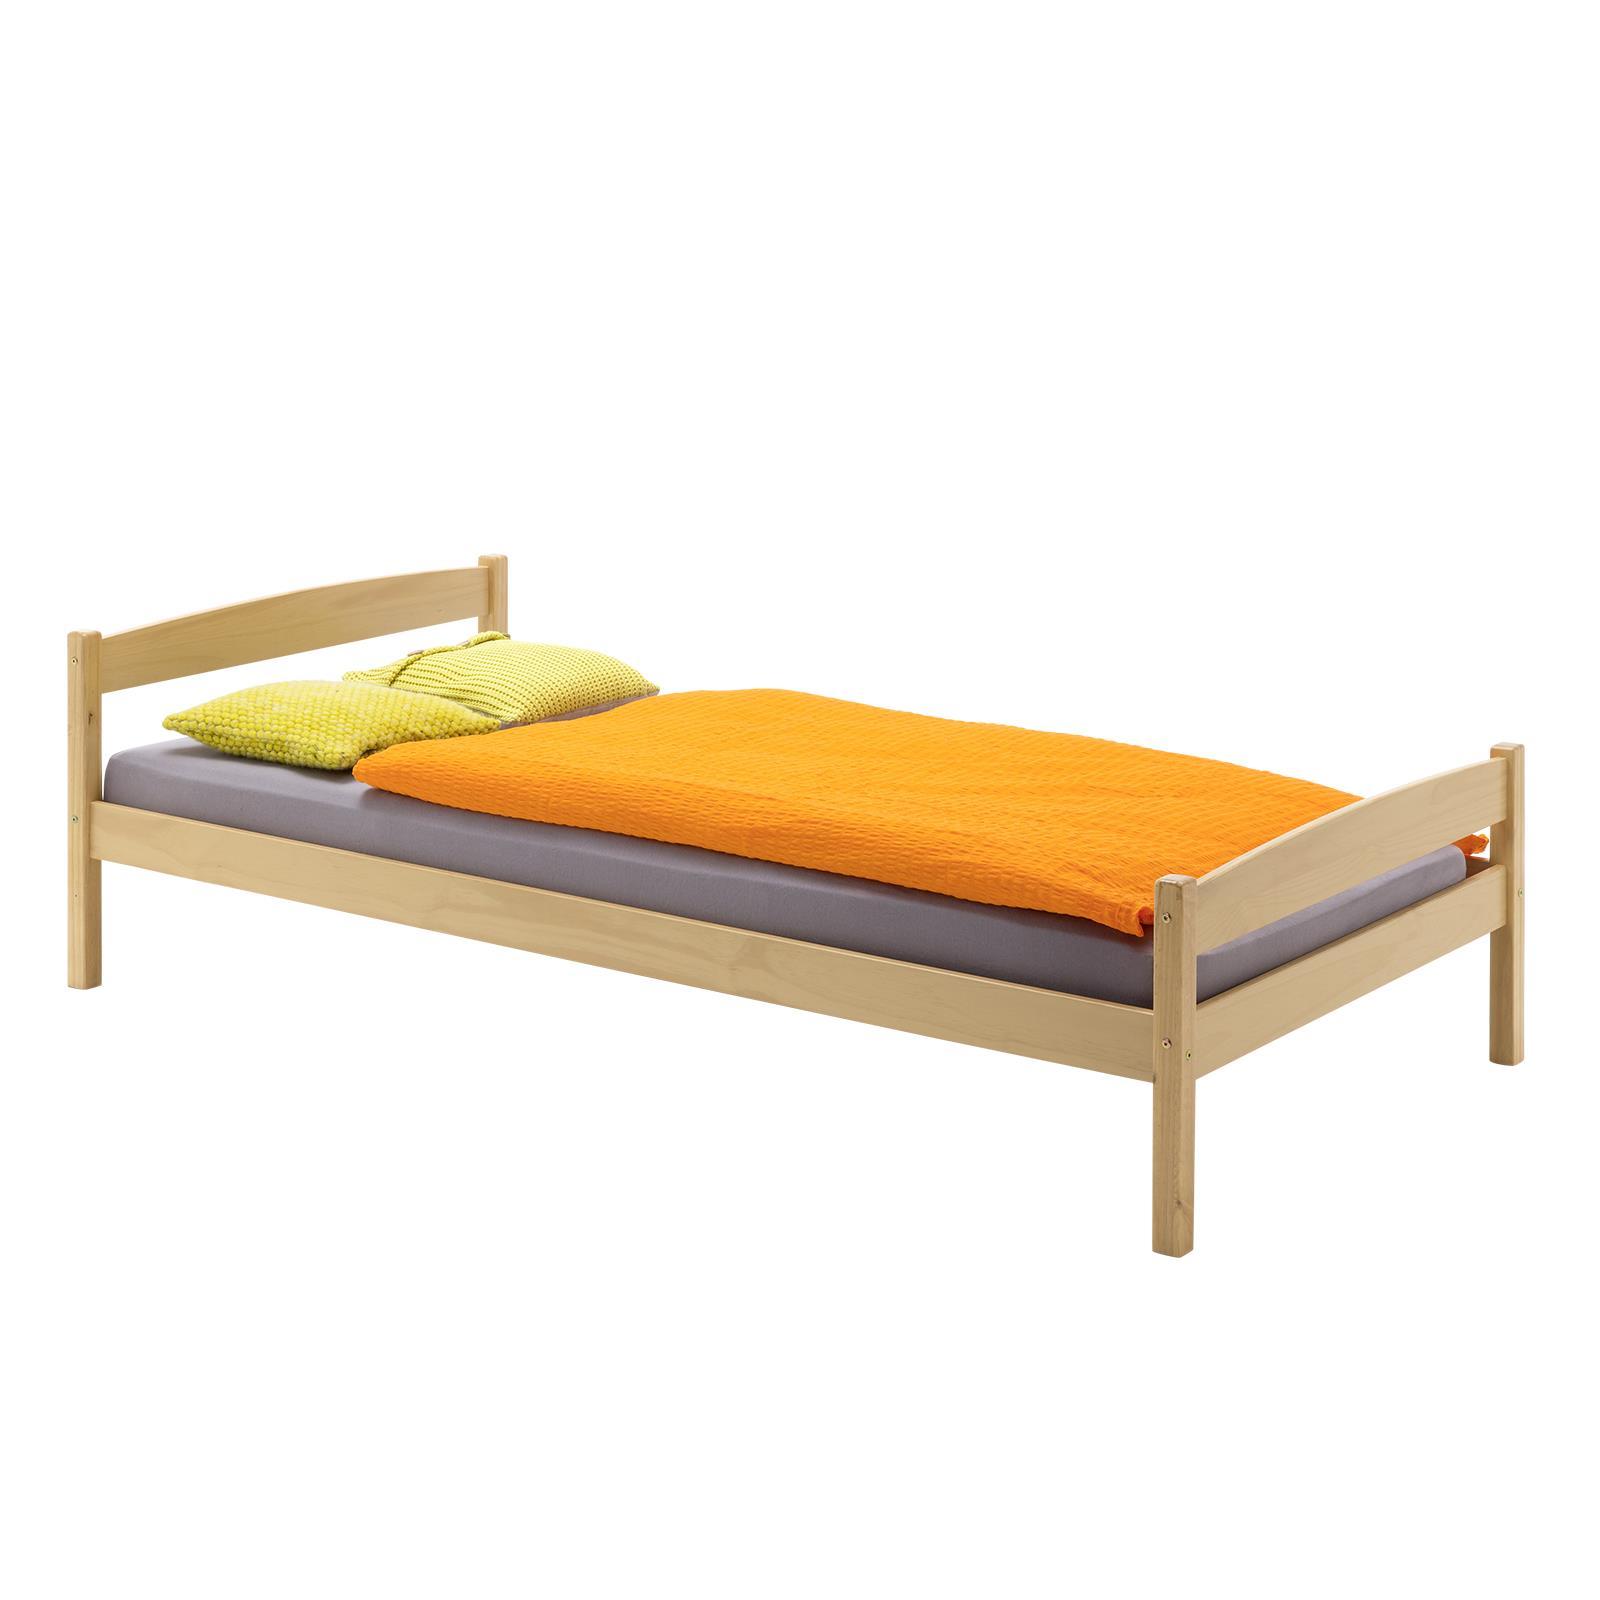 jugendbett kinderbett kiefer natur 90 x 200 cm ebay. Black Bedroom Furniture Sets. Home Design Ideas